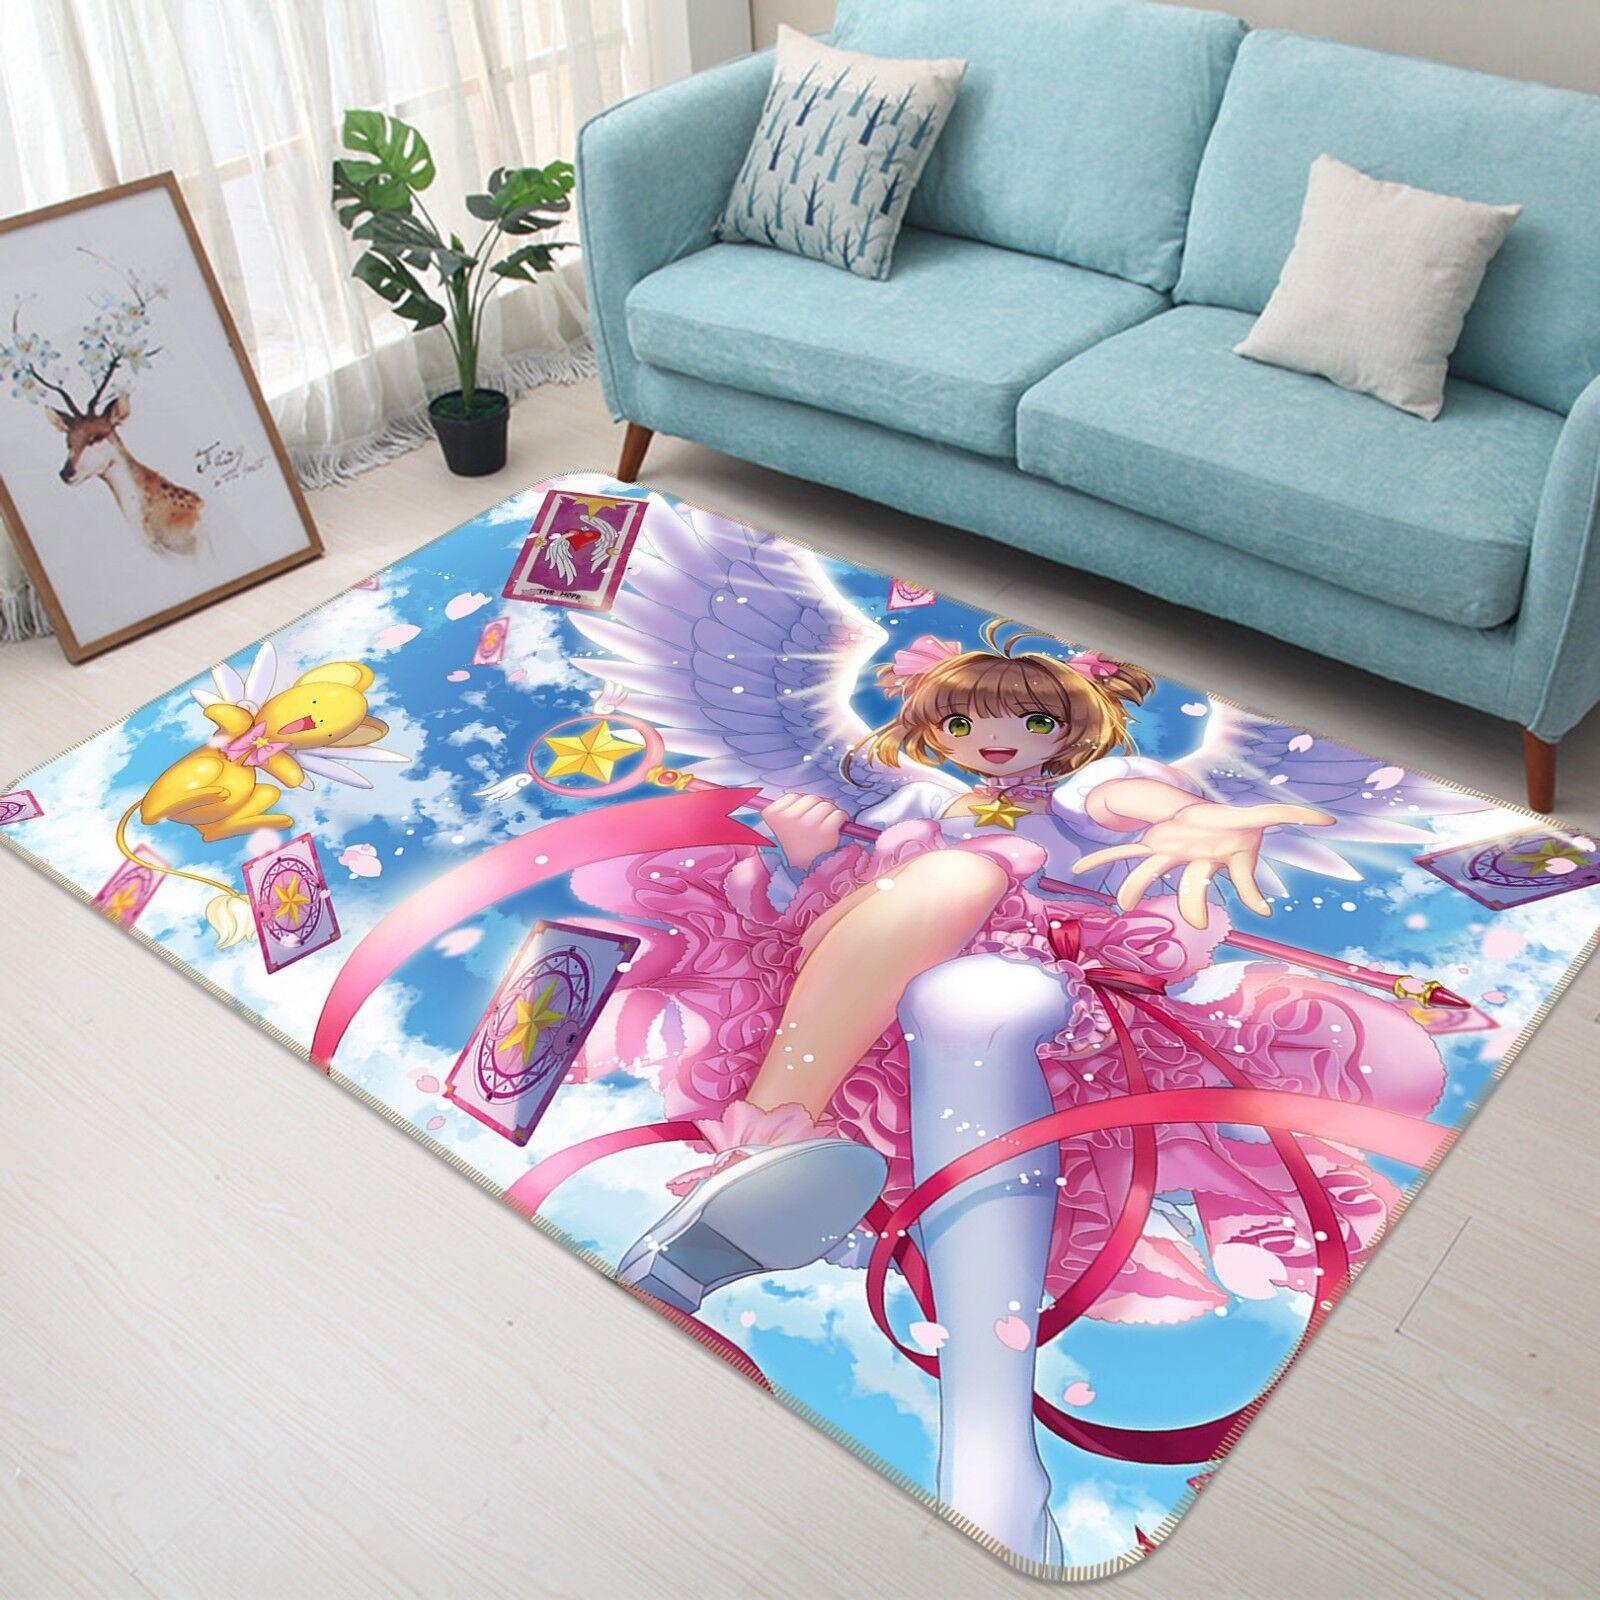 3D Cardcaptor Sakura 531 Japan Japan Japan Anime Rutschfest Matte Runden Elegant Teppich DE 0dba20